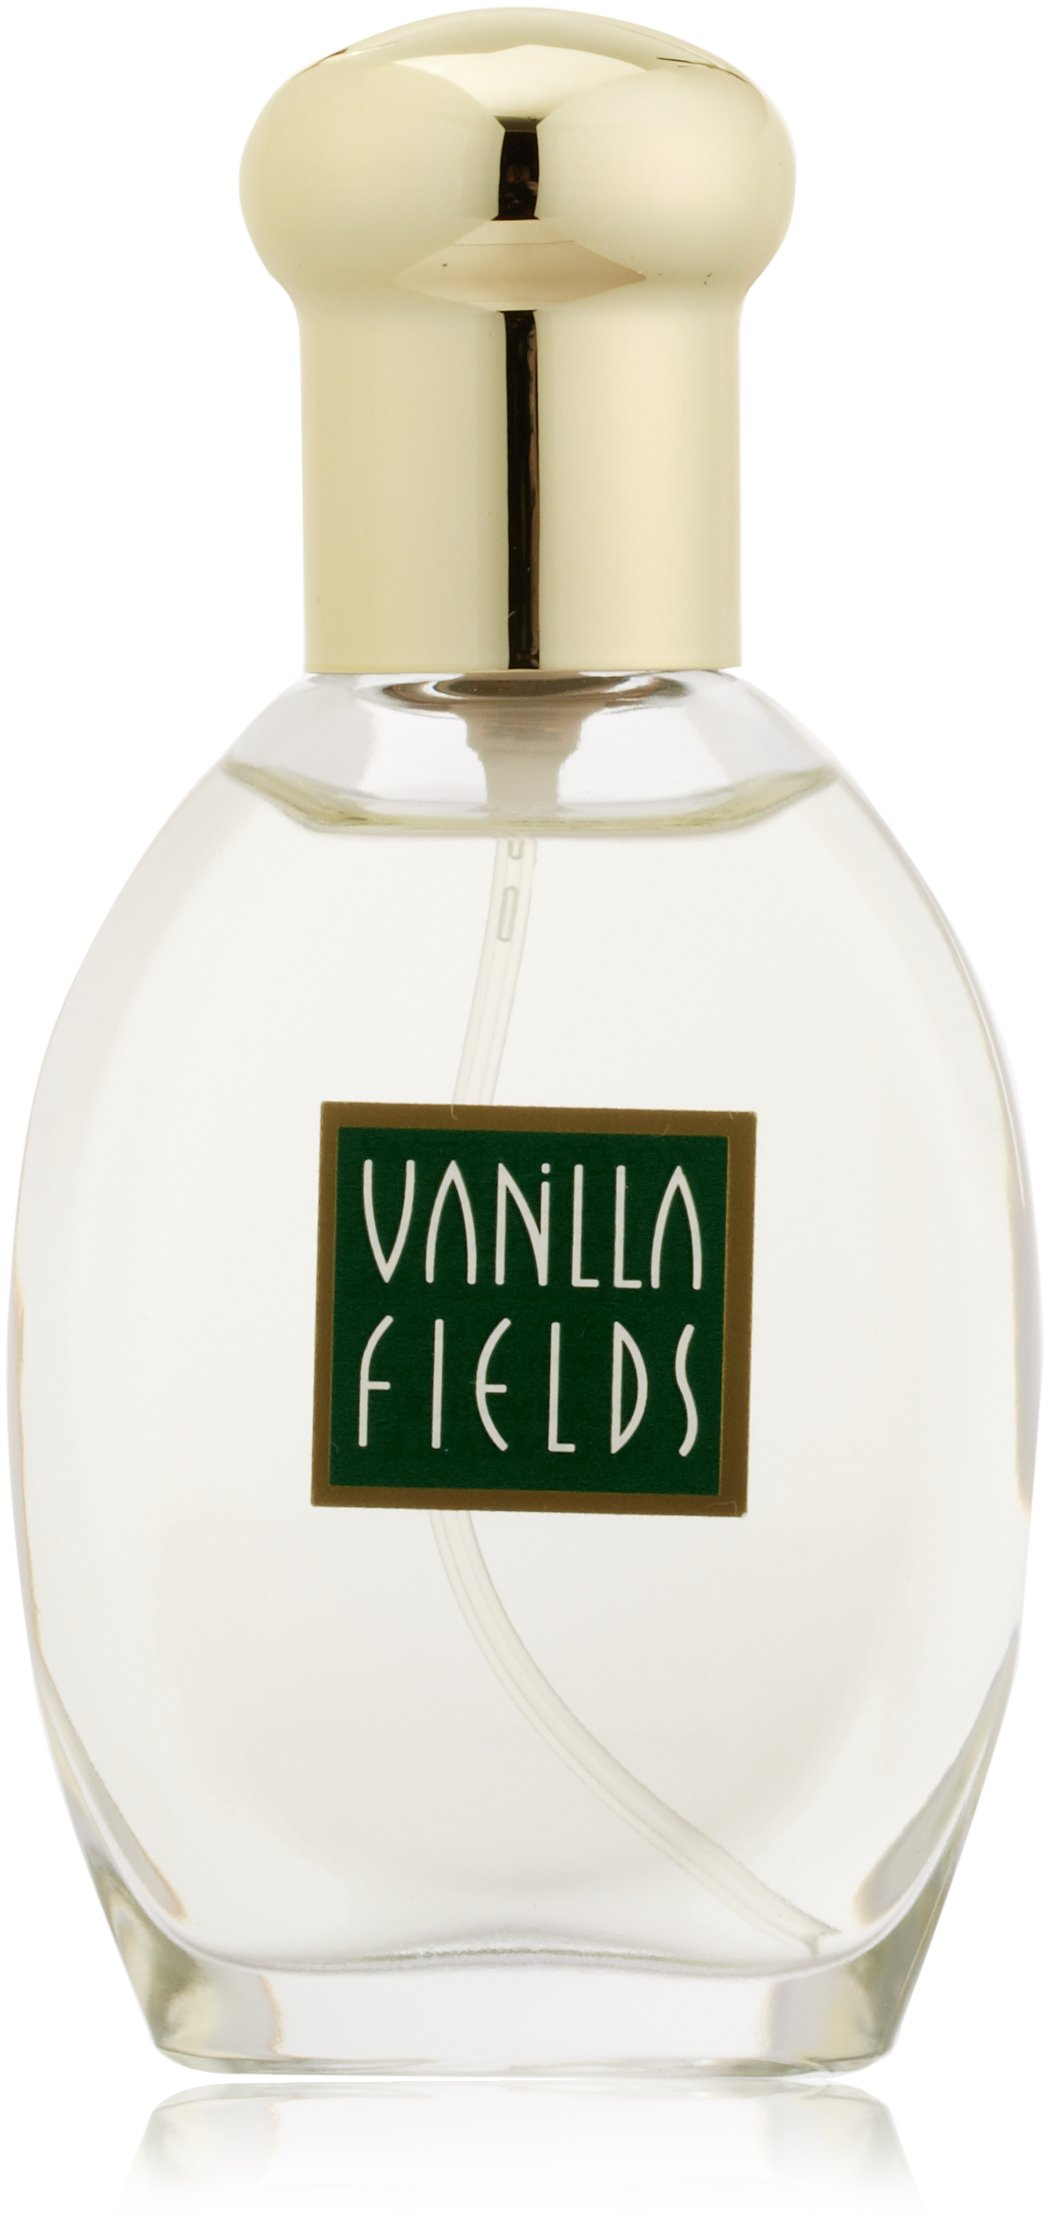 Vanilla Fields Cologne Spray for Women by Vanilla Fields 0.75 Fluid Ounce Bottle A Classic Fragrance of Vanilla, Sparkling Mimosa, & Jasmine